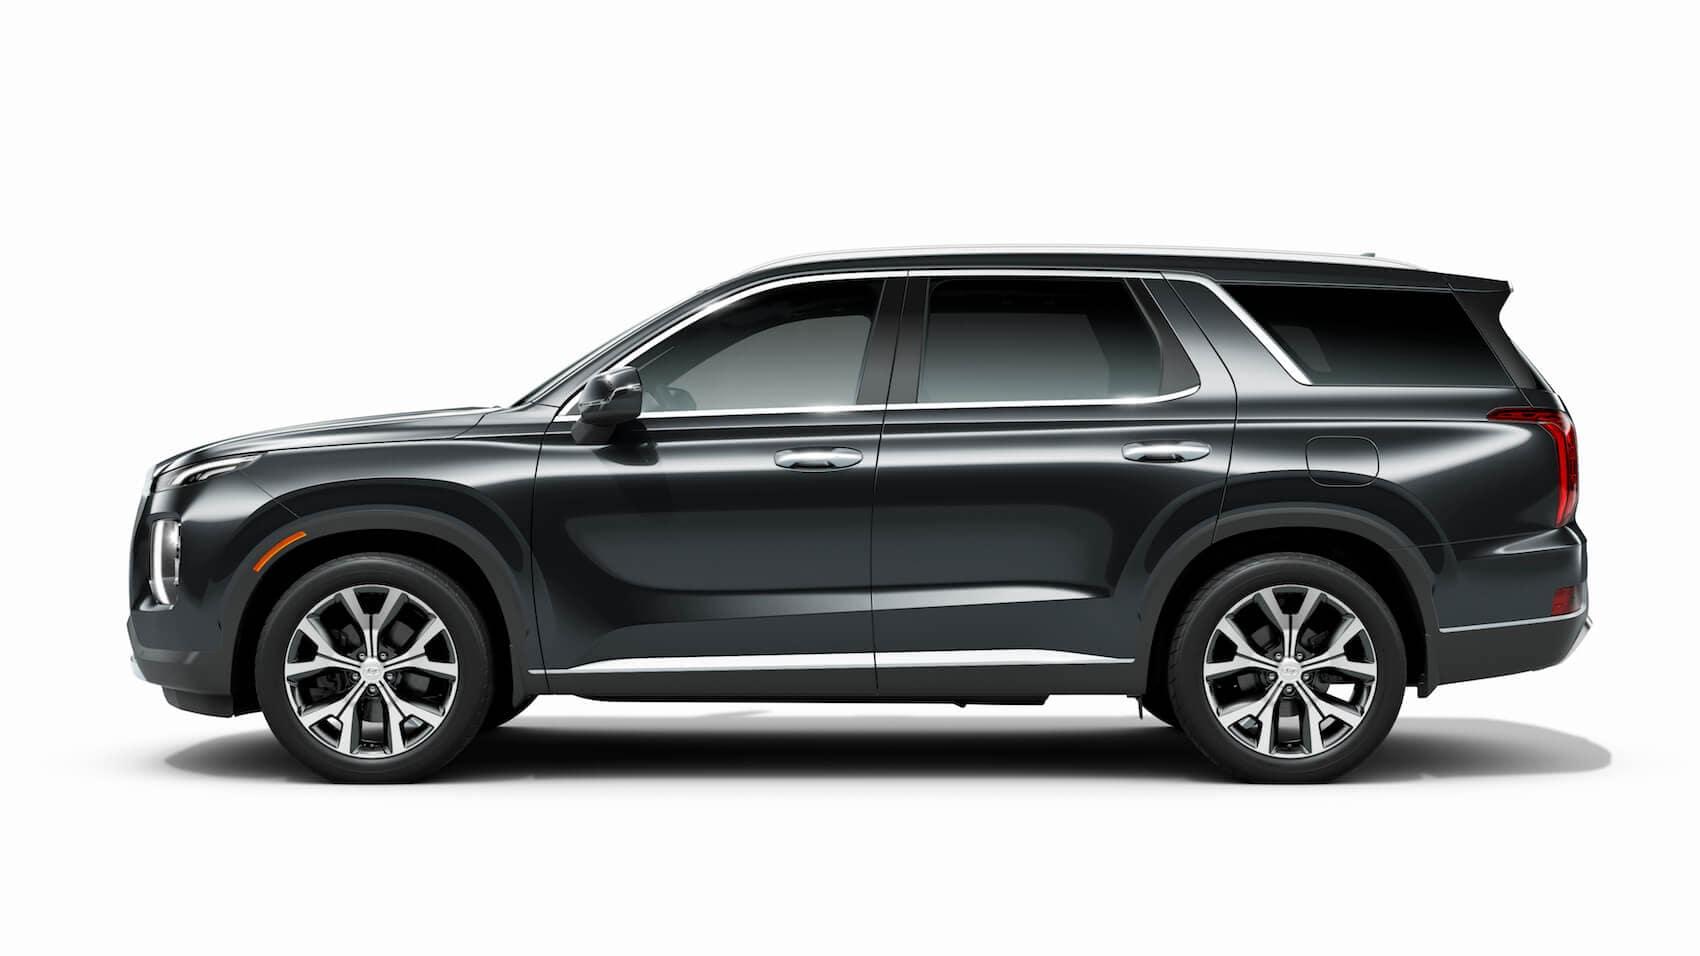 2020 Hyundai Palisade SEL trim level Littleton, CO